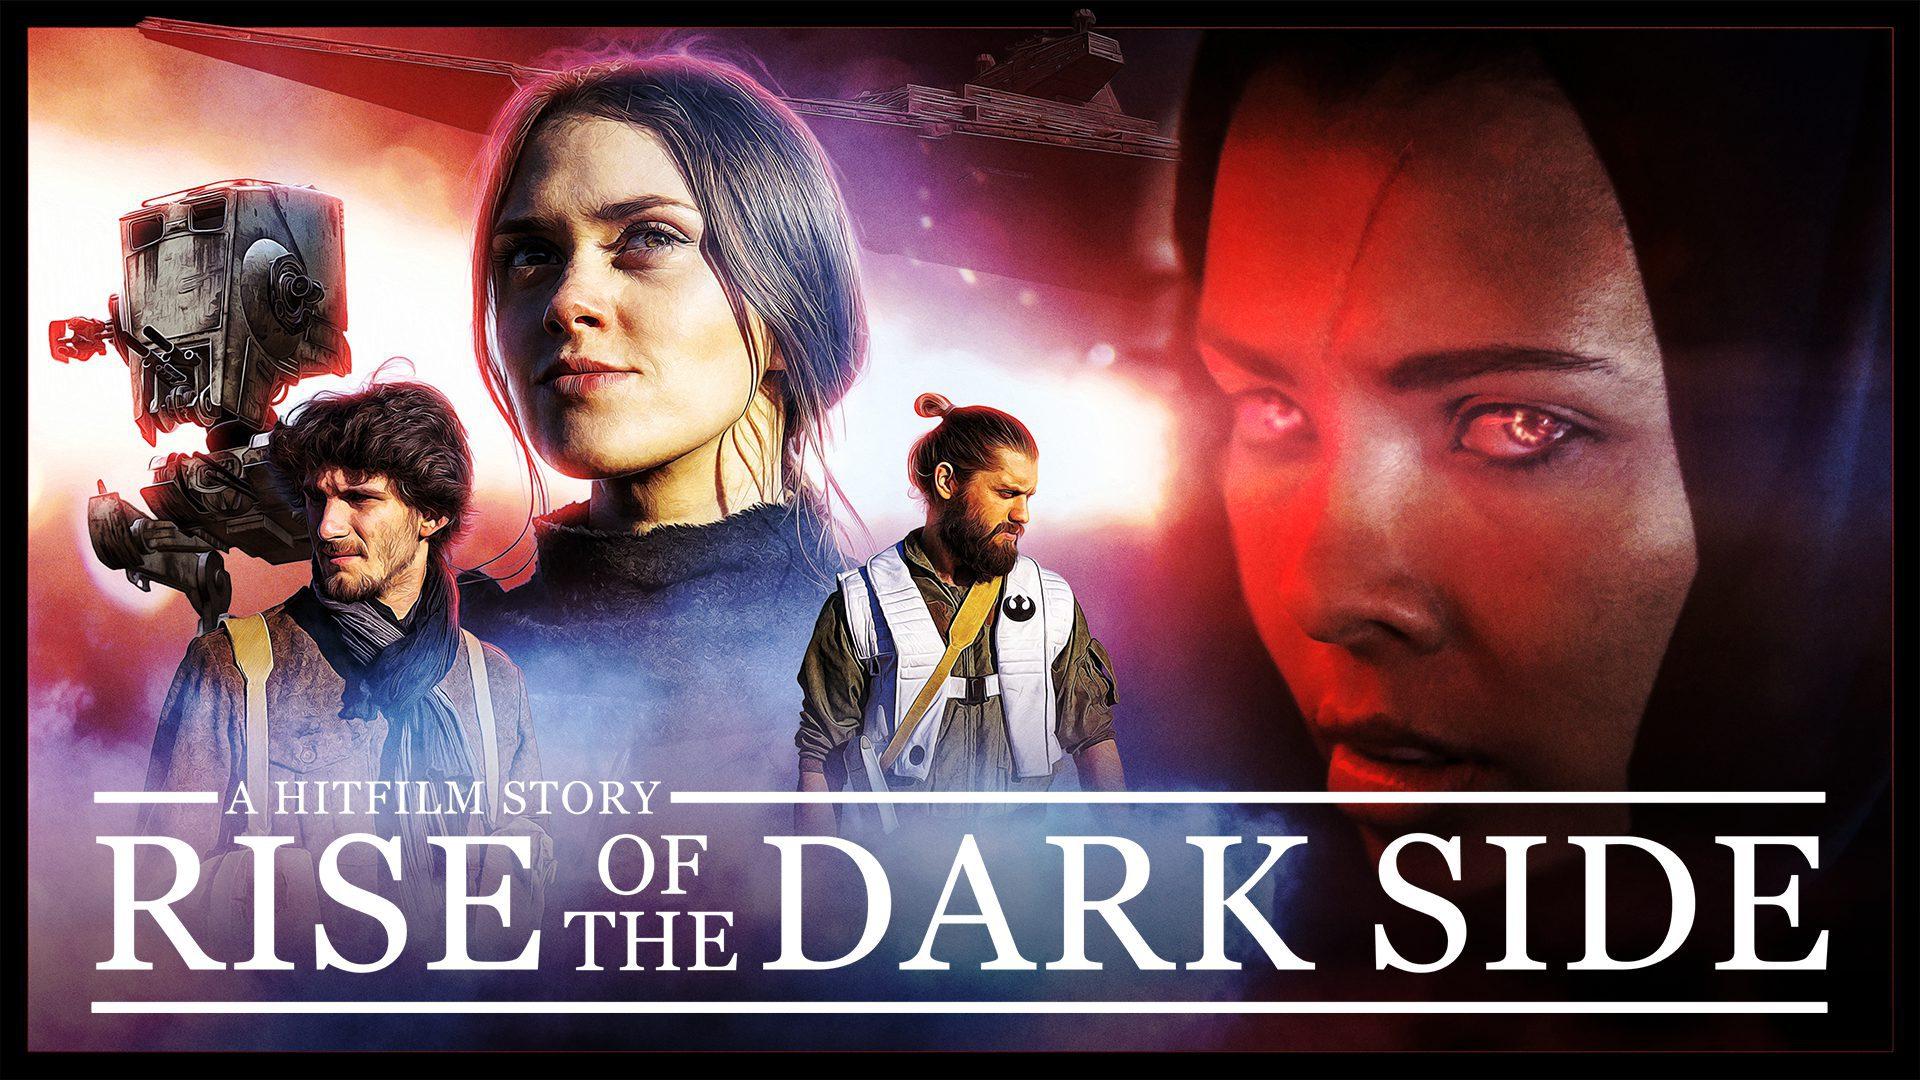 Rise of the Dark Side Star Wars-inspired fan film trailer thumbnail